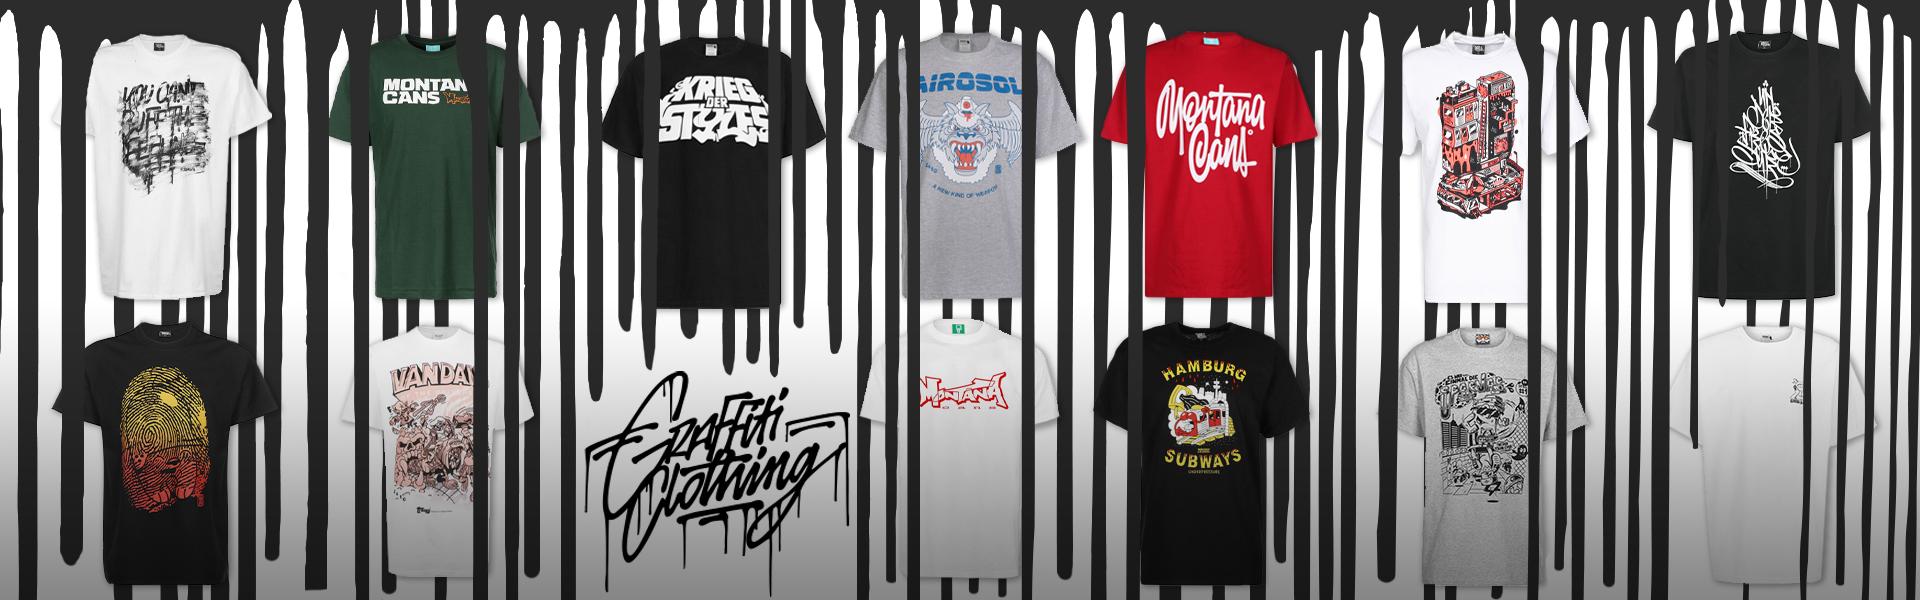 Graffiti Clothing